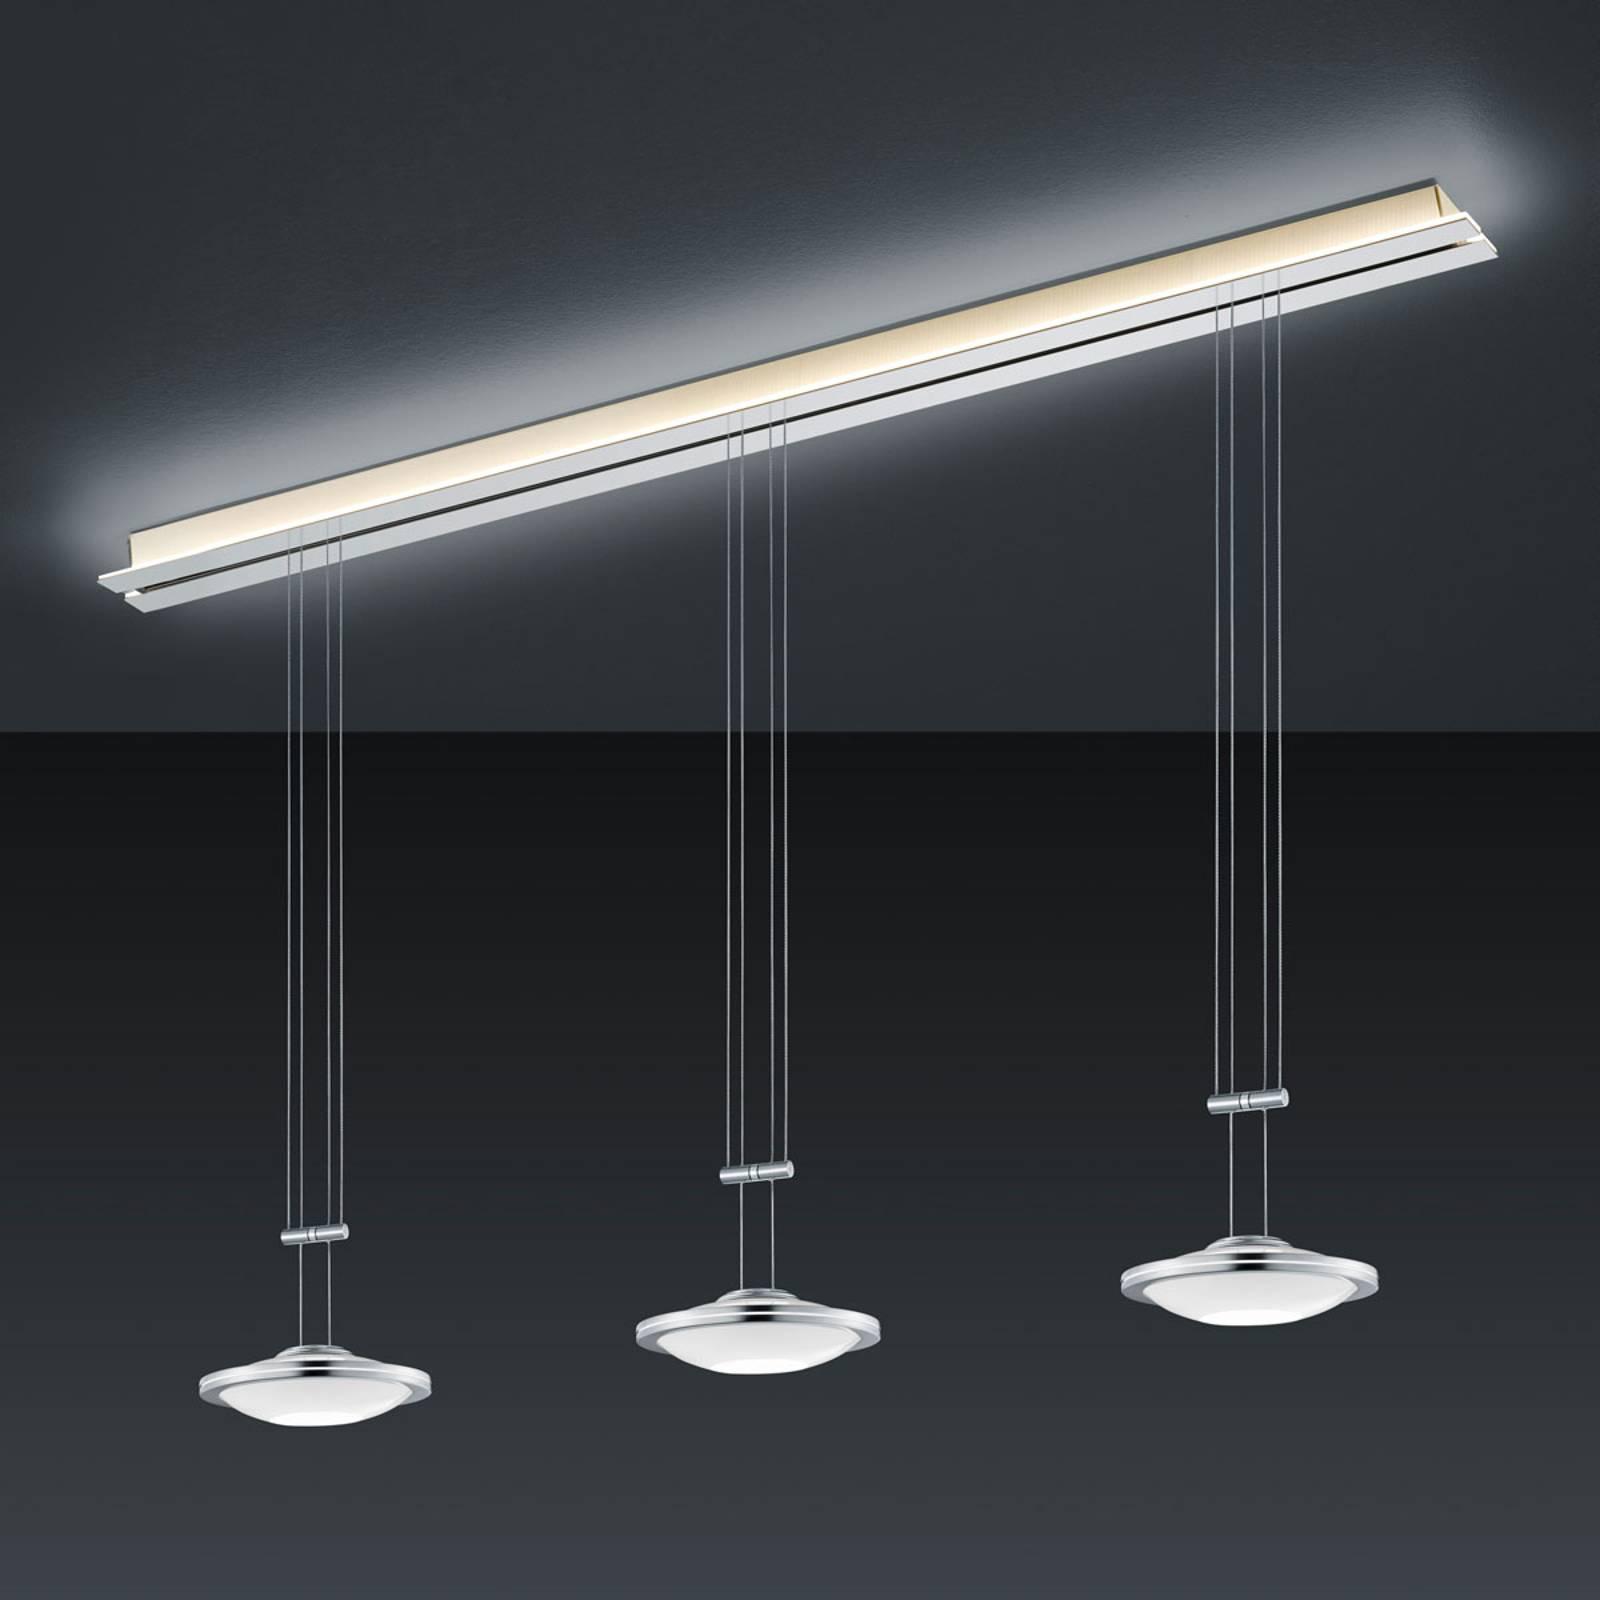 BANKAMP Strada Saturno riippuvalo 3-lamp., 155 cm